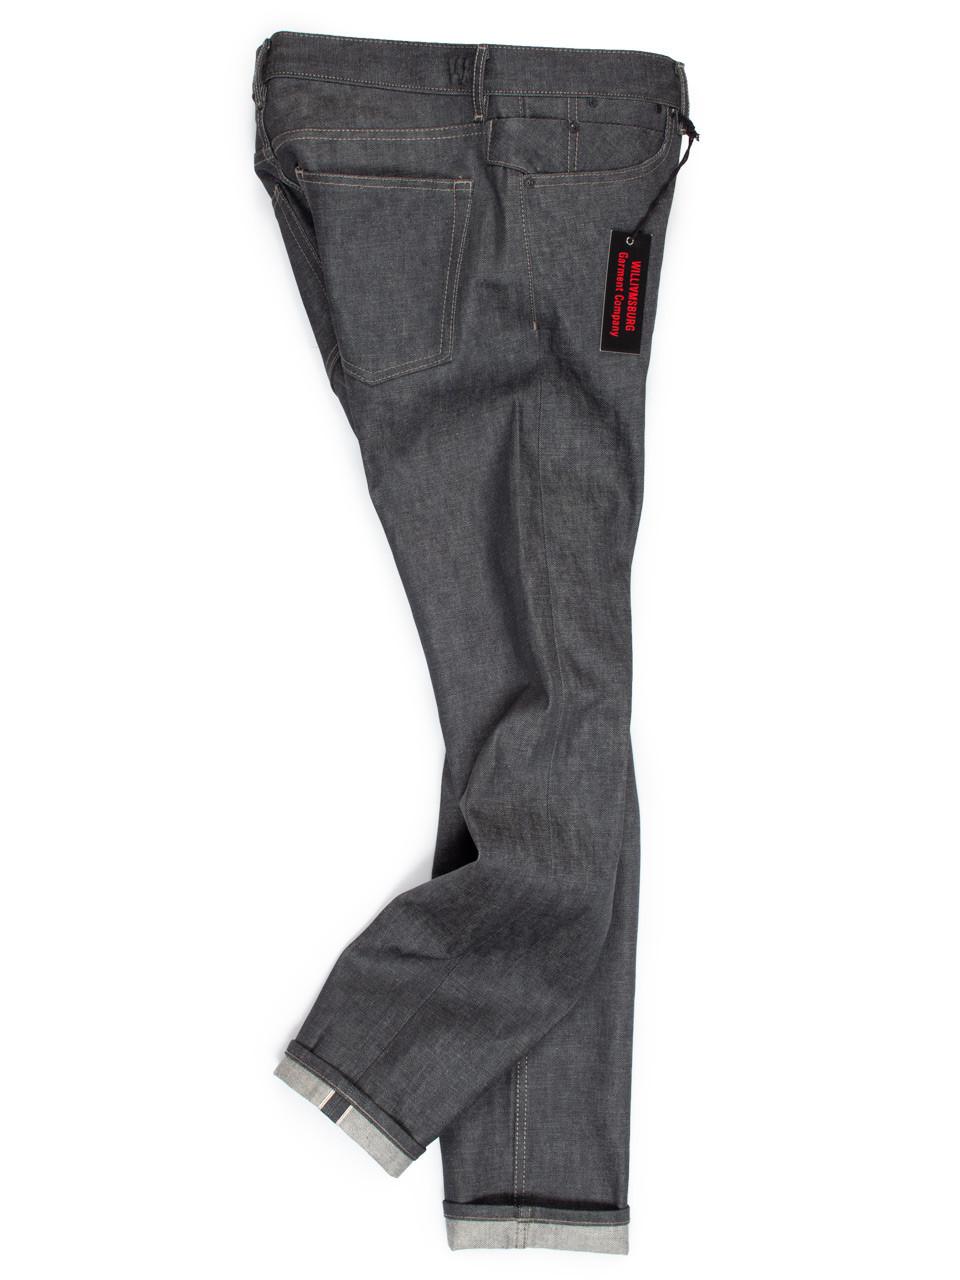 Tall Men S 38 Inseam Gray Selvedge Raw Denim Slim Jeans Williamsburg